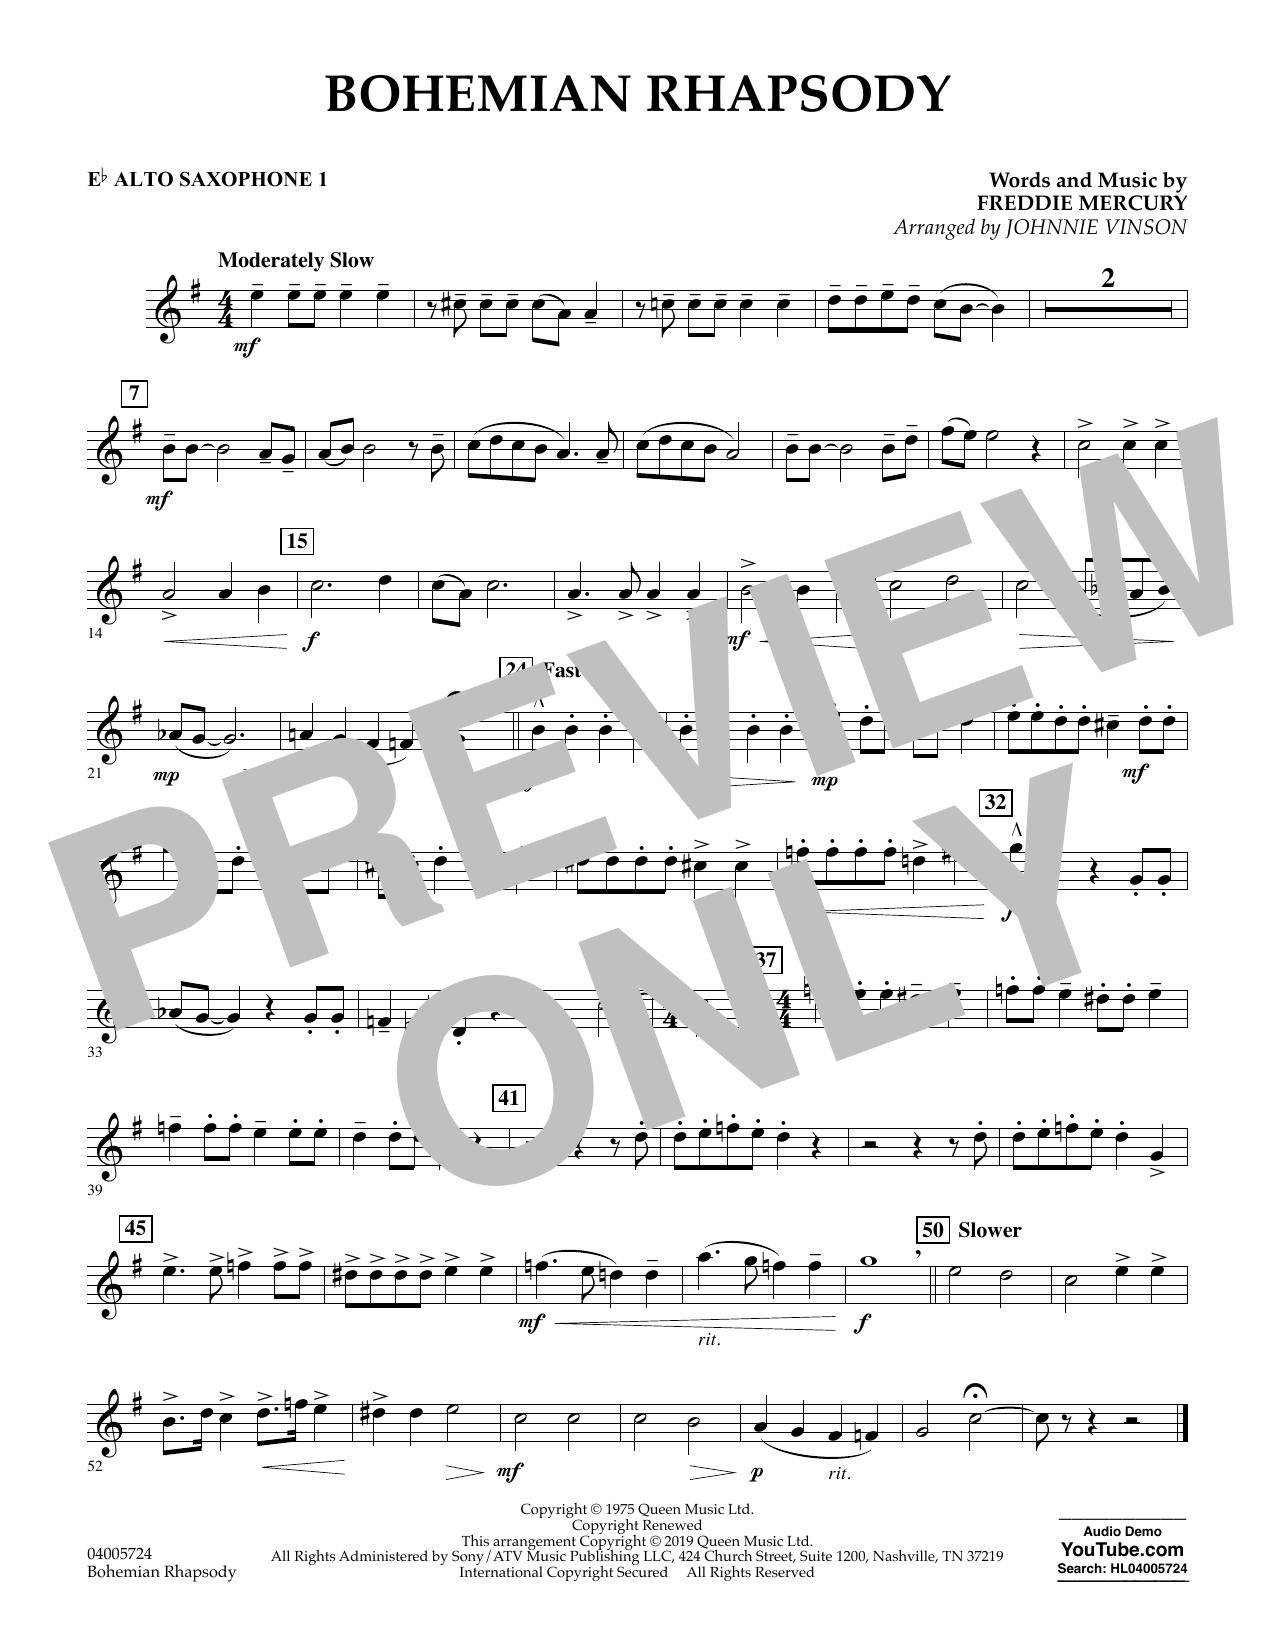 Bohemian Rhapsody (arr. Johnnie Vinson) - Eb Alto Saxophone 1 (Concert Band)